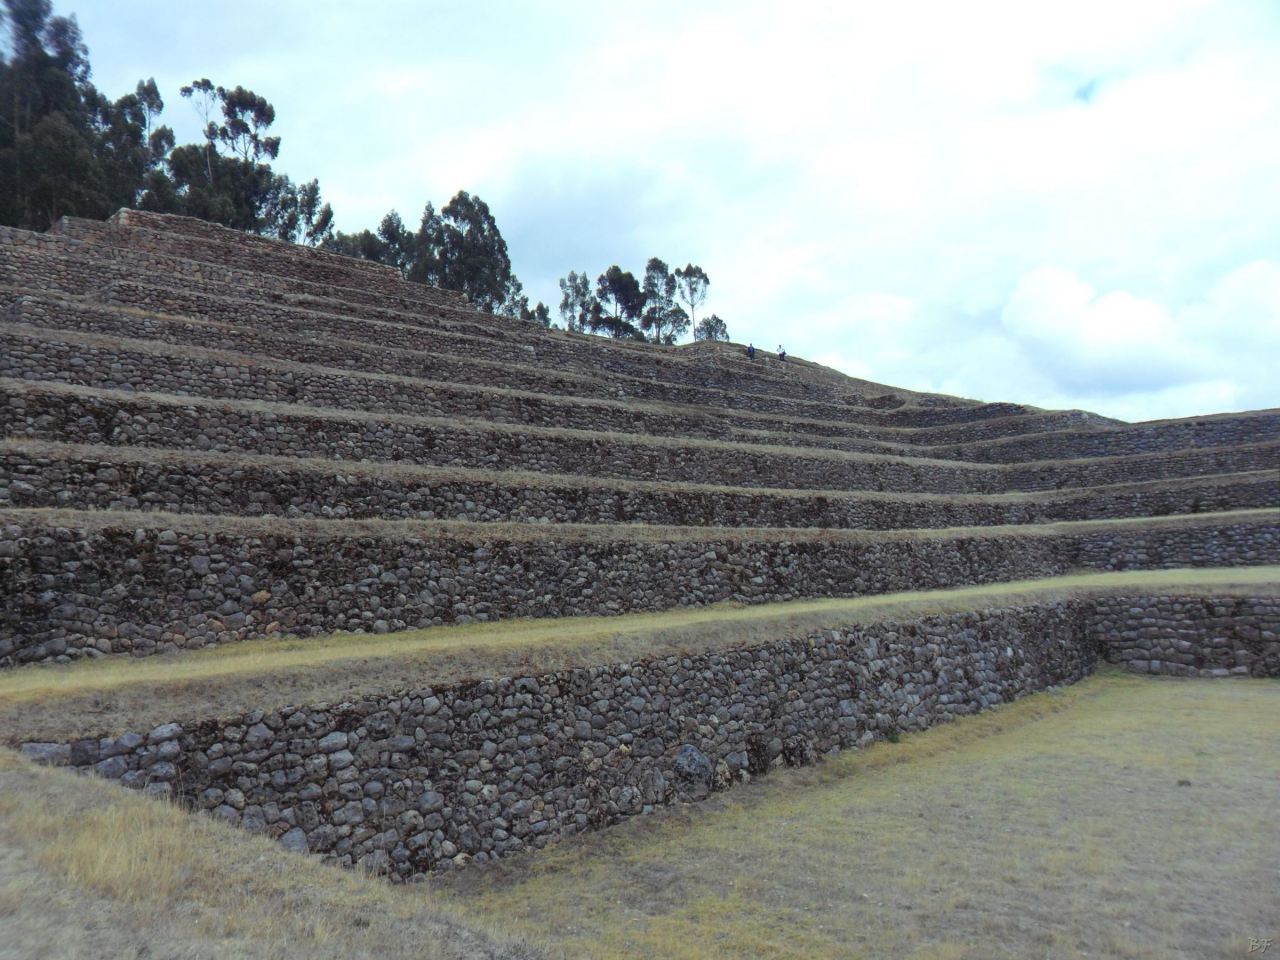 Chinchero-Mura-Poligonali-Piramide-Urubamba-Peru-76